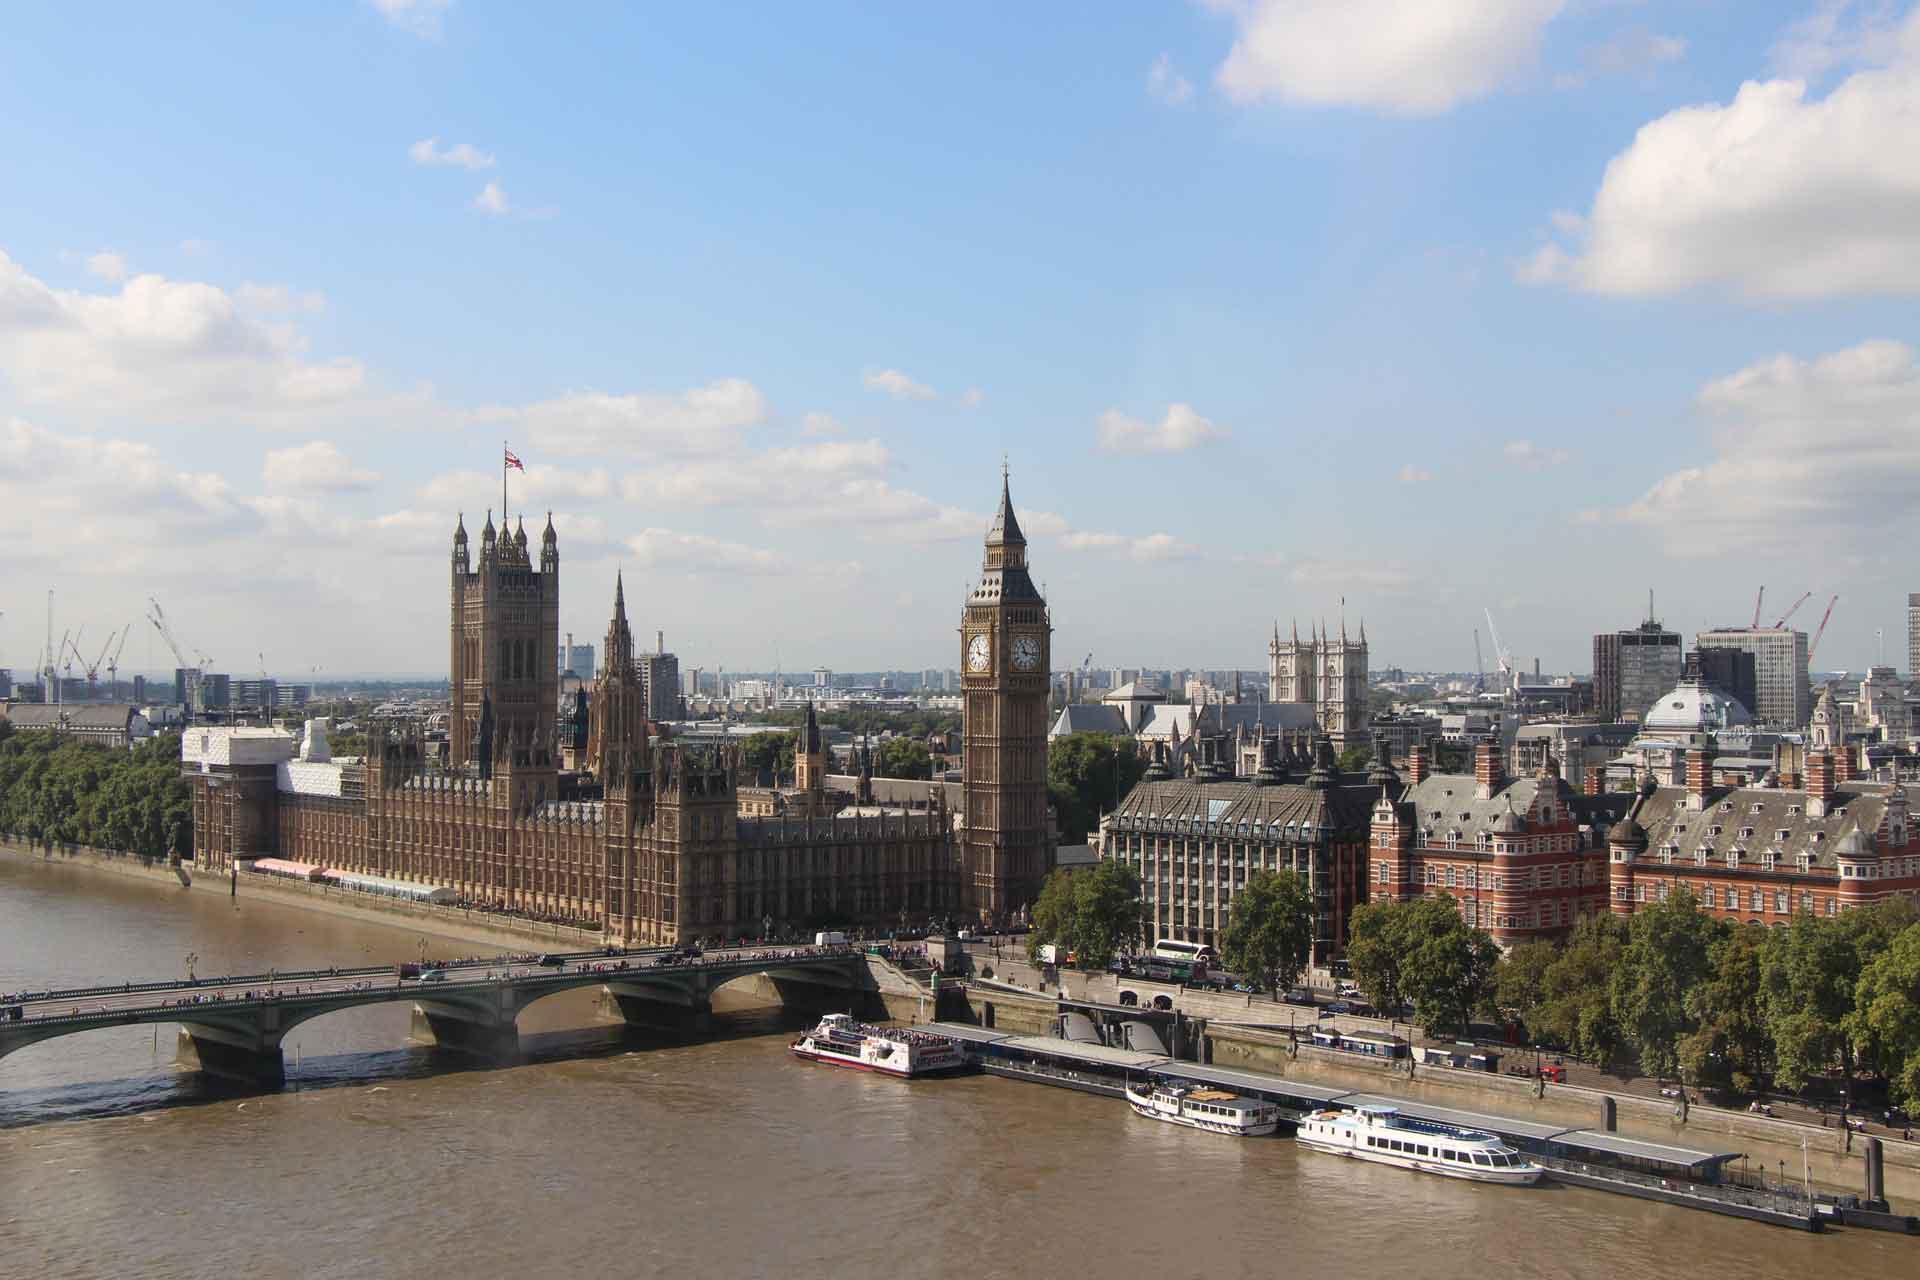 View of Big Ben London